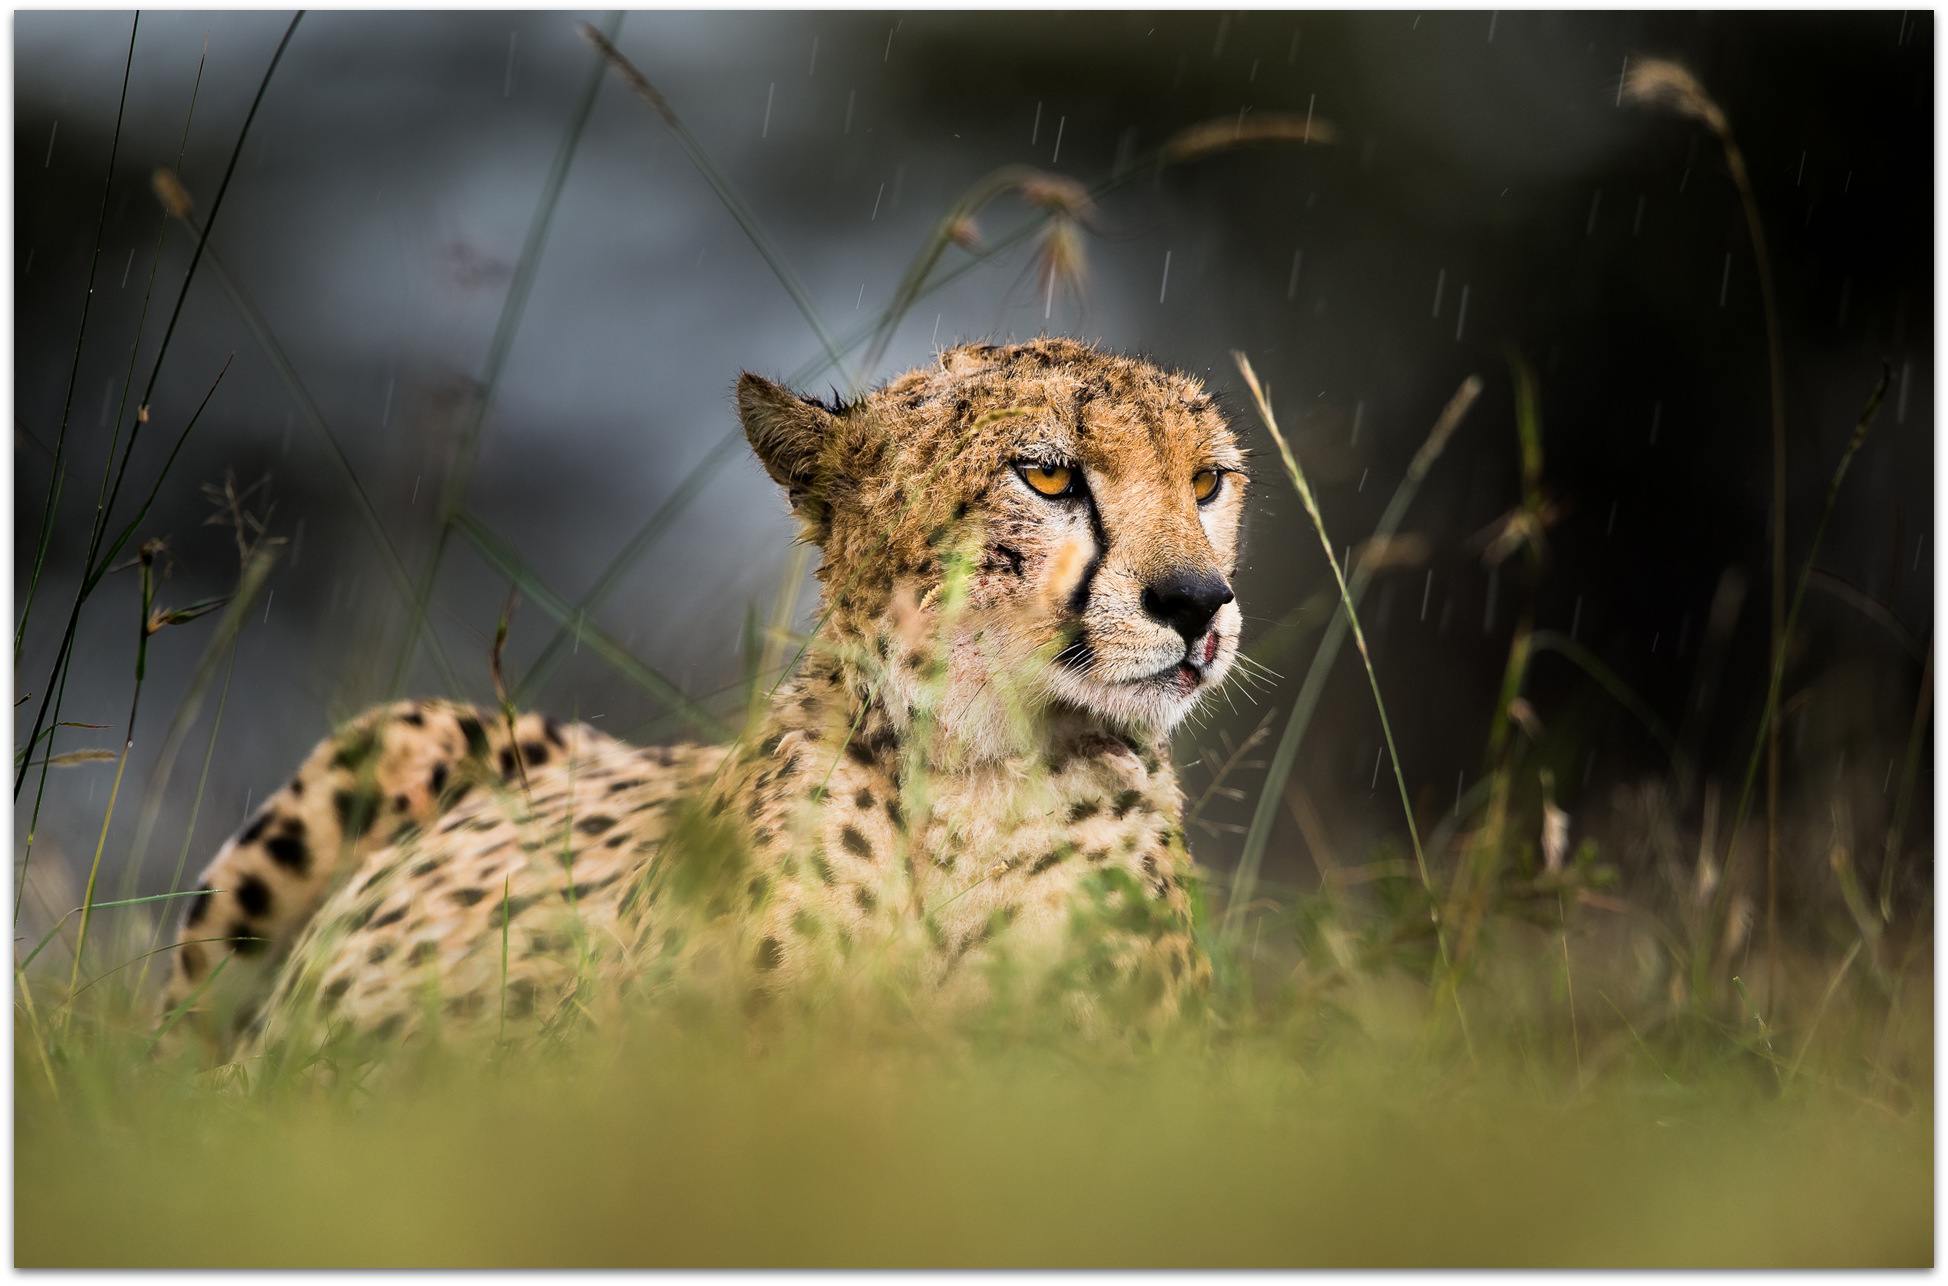 Cheetah in the rain in the Maasai Mara